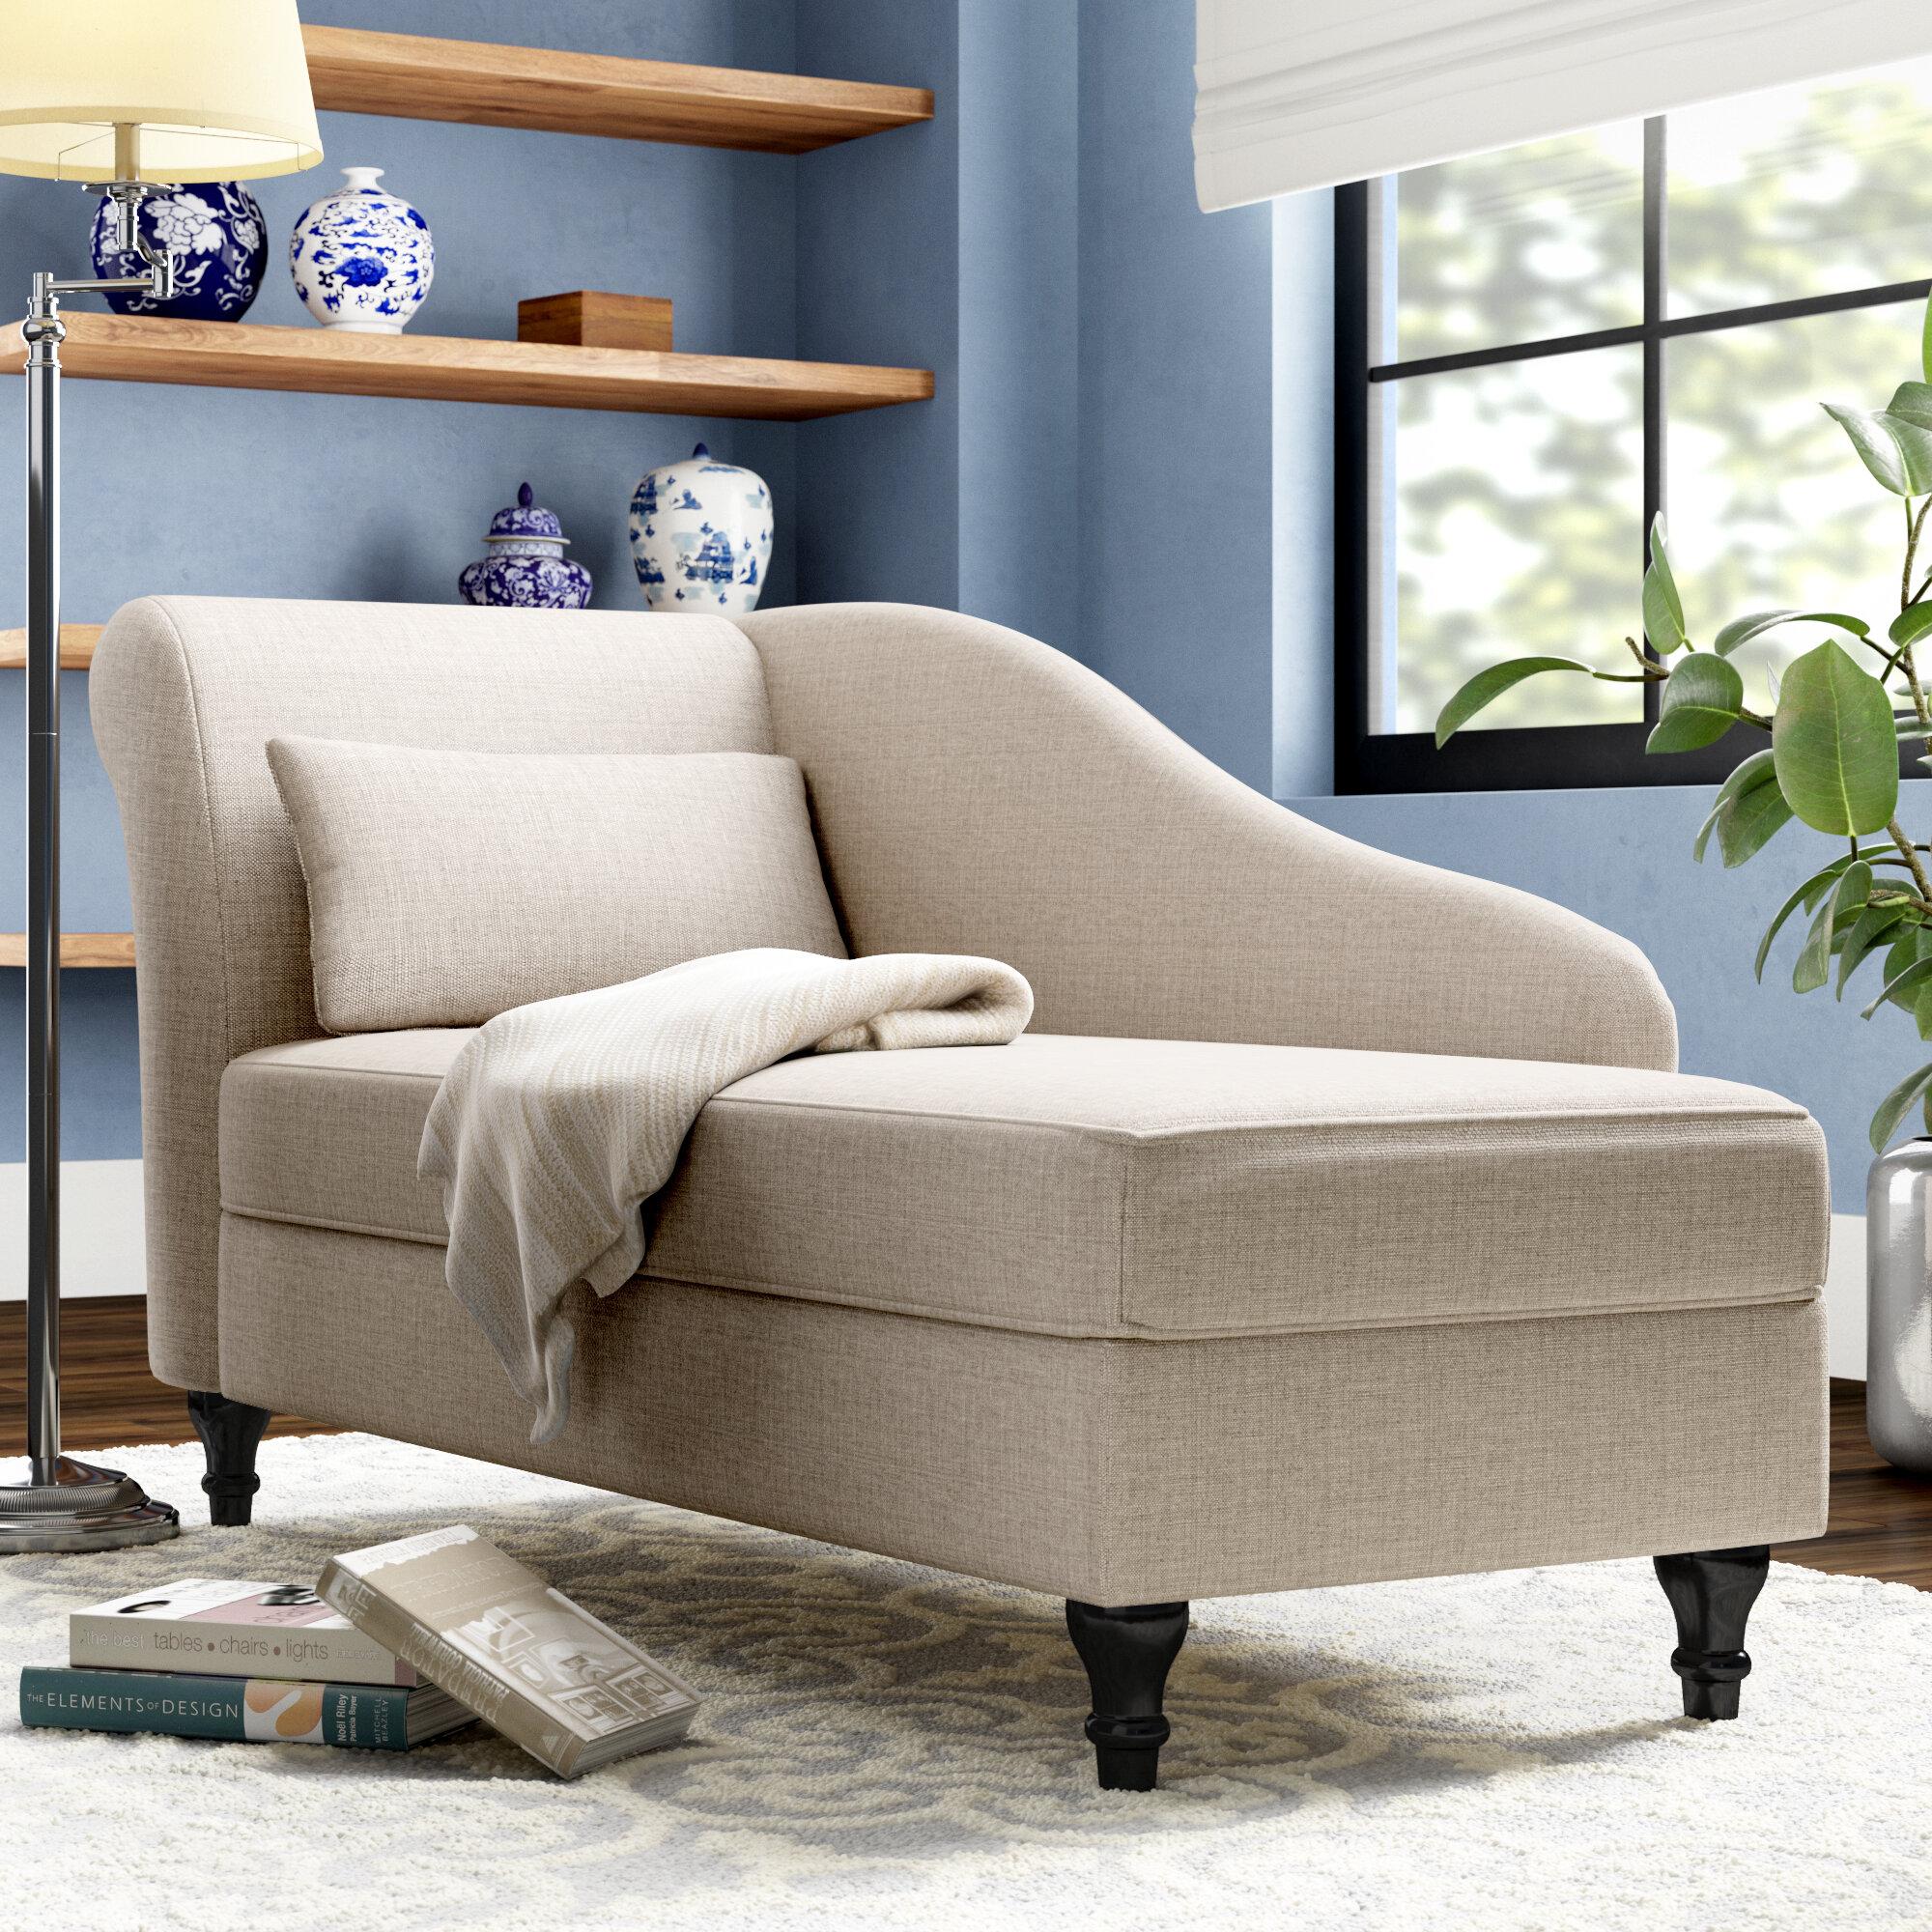 Fine 134 Indoor Lounge Furniture Home Decor Download Free Architecture Designs Embacsunscenecom